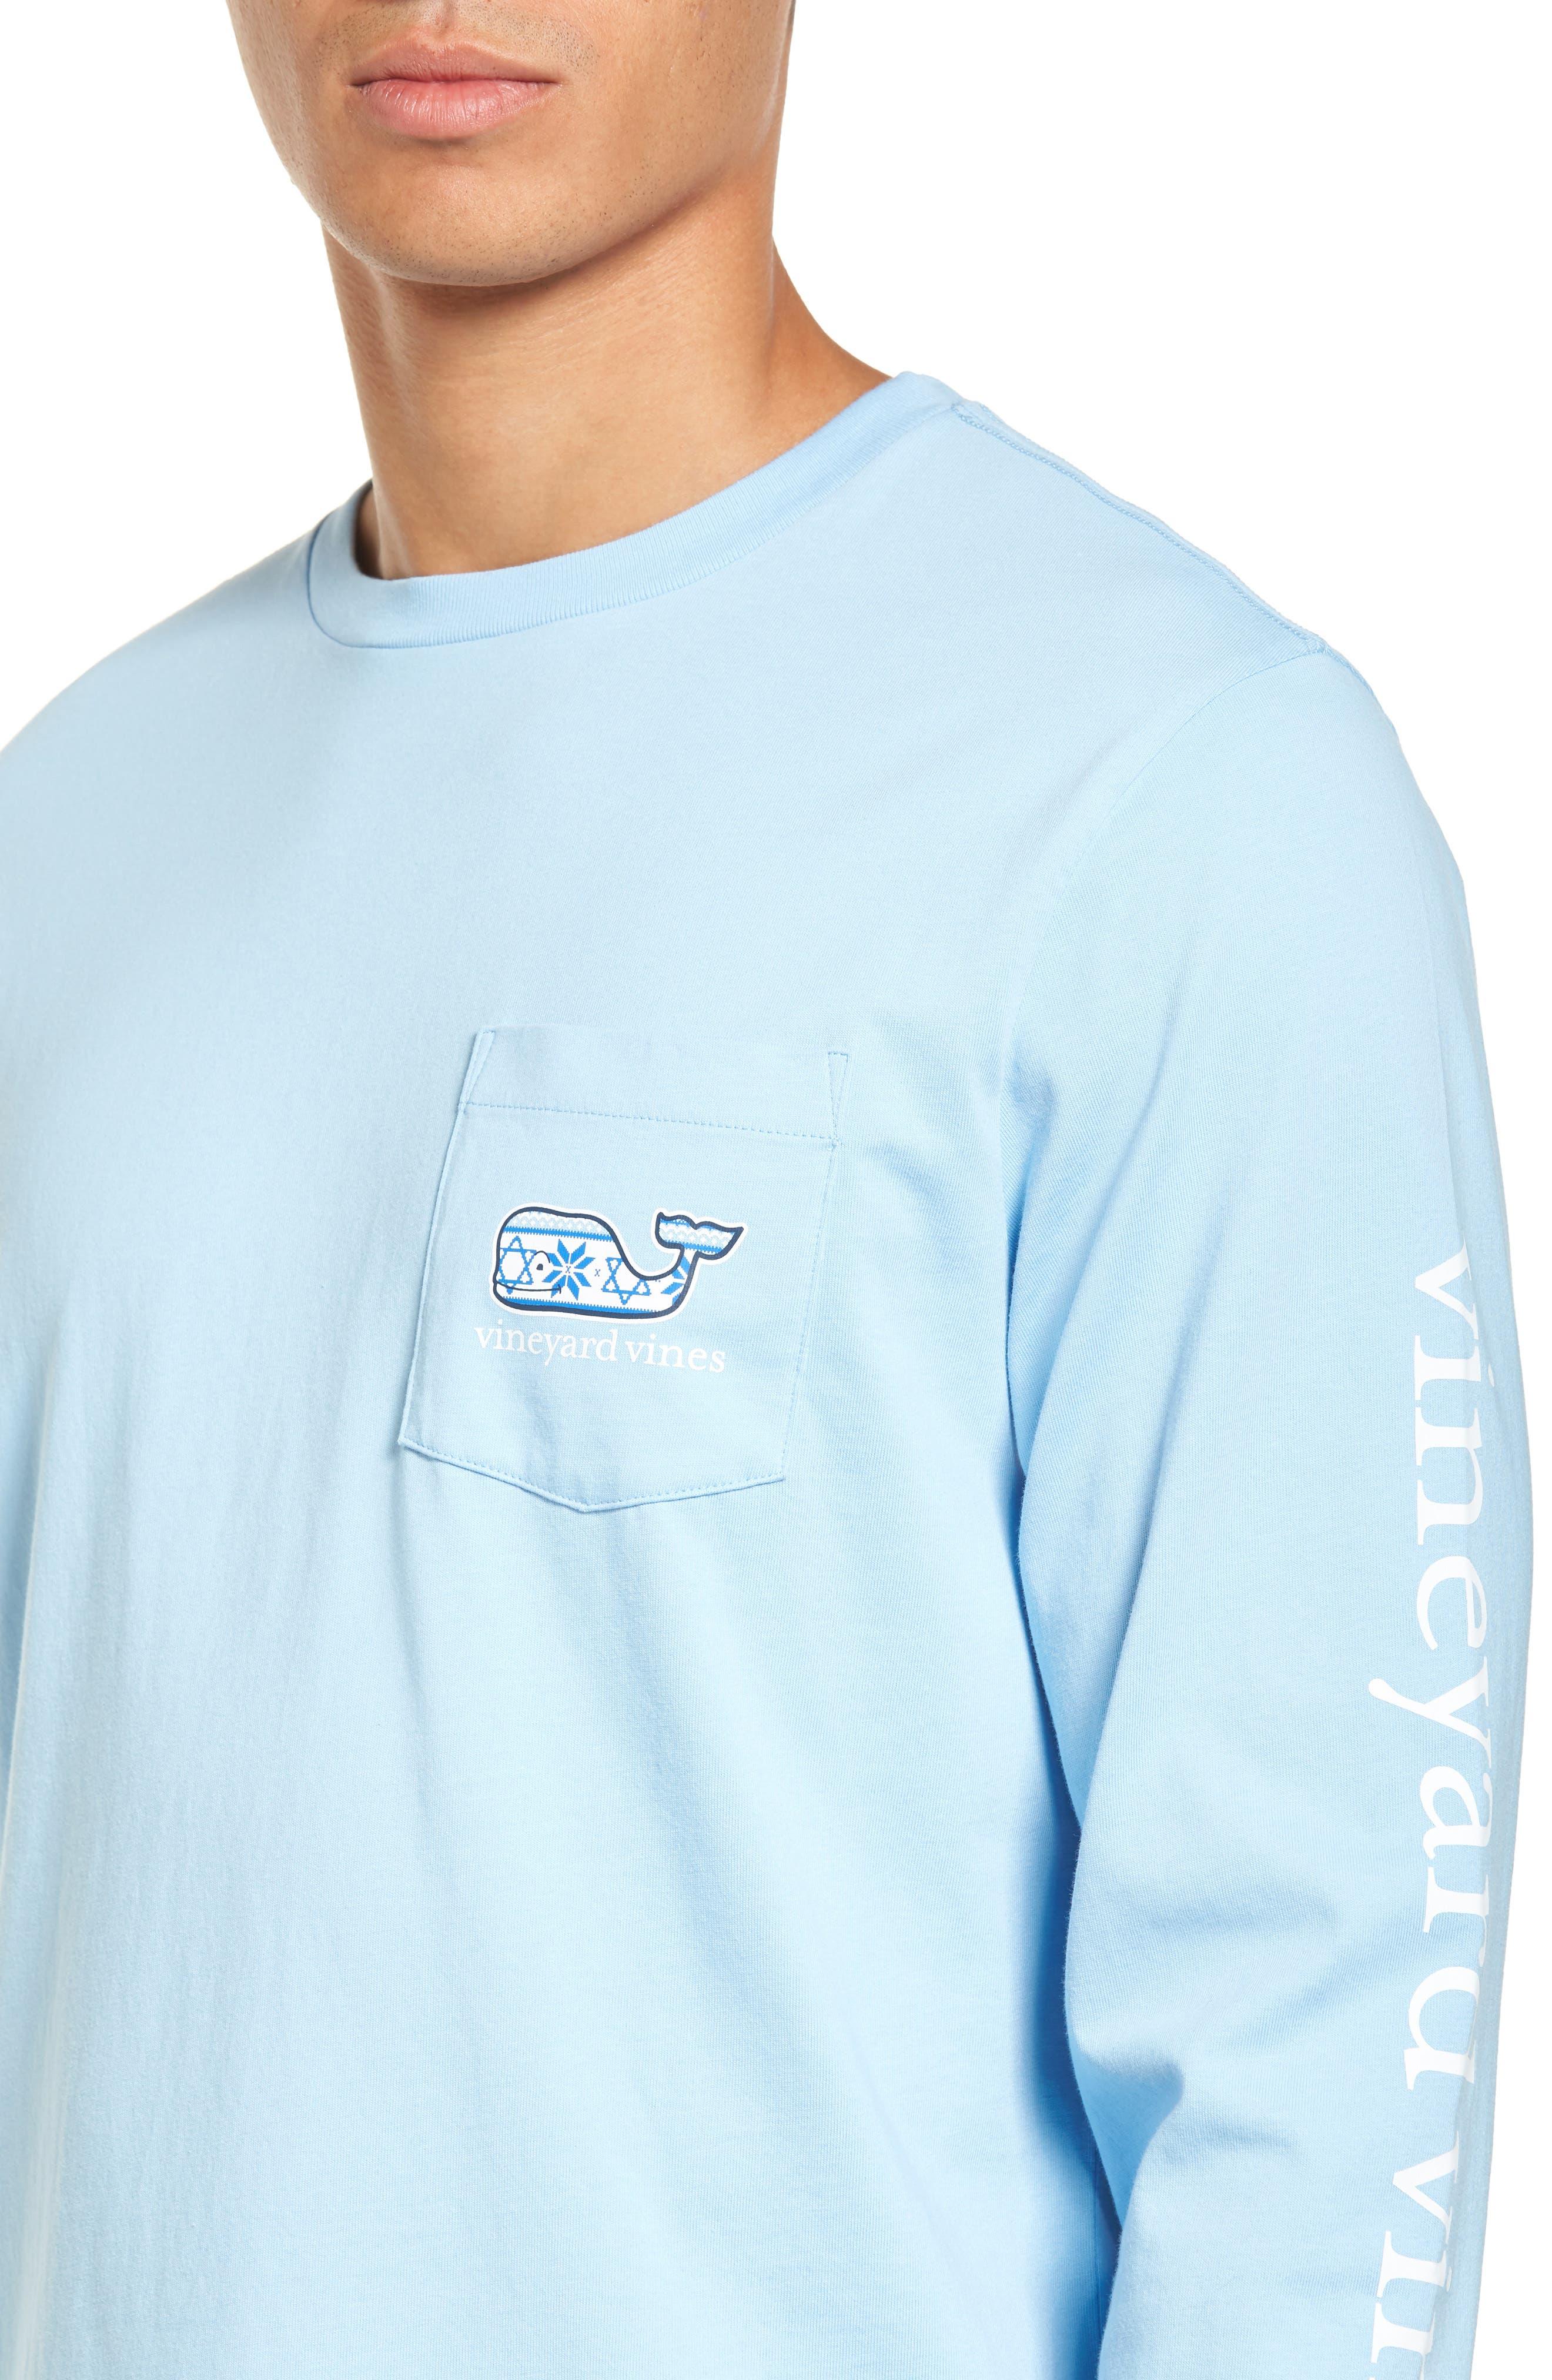 Hanukkah Fair Isle Whale Fill Pocket T-Shirt,                             Alternate thumbnail 4, color,                             456